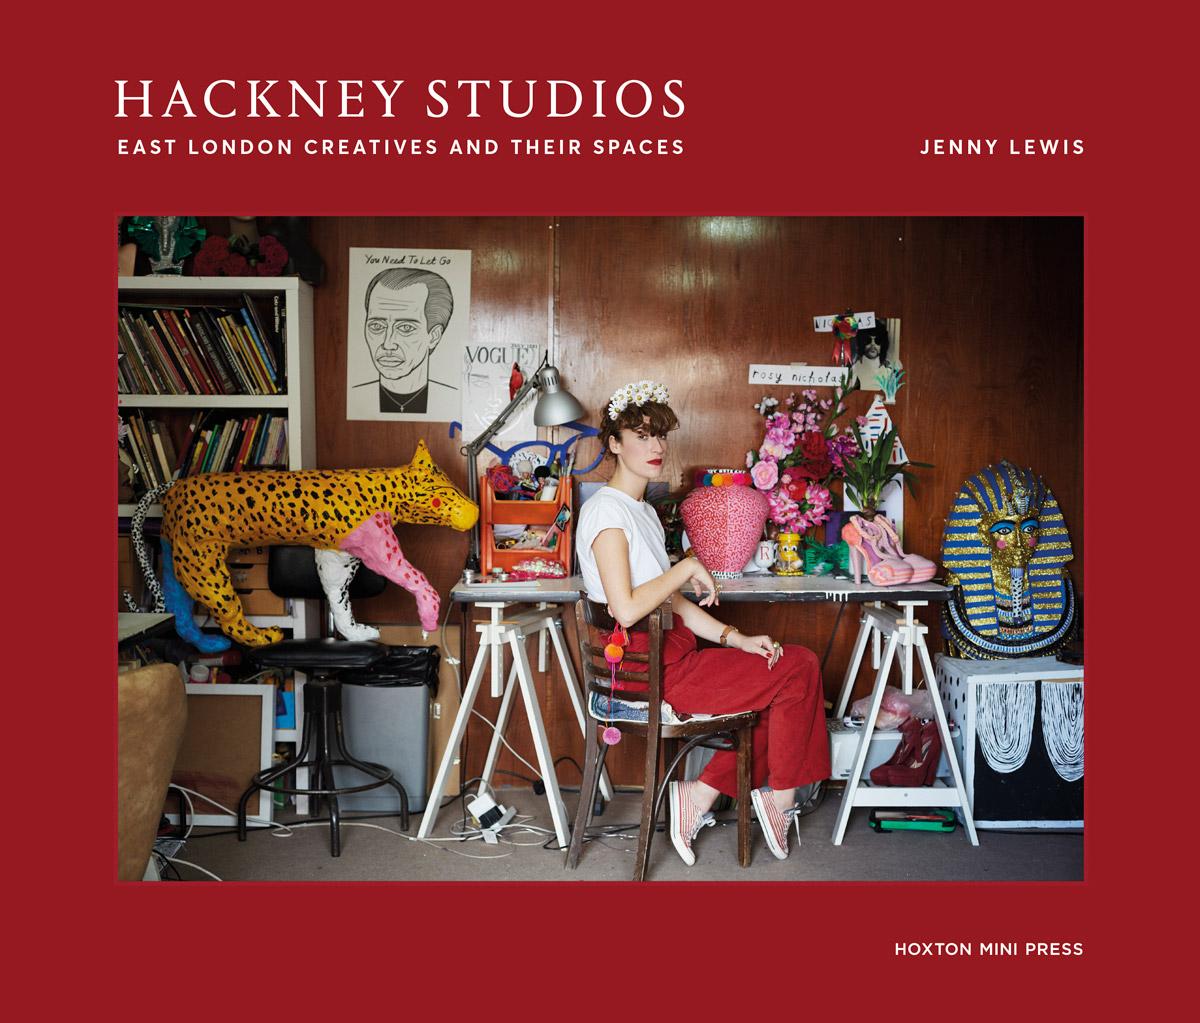 Hackney-Studios-UK-cover_low-res